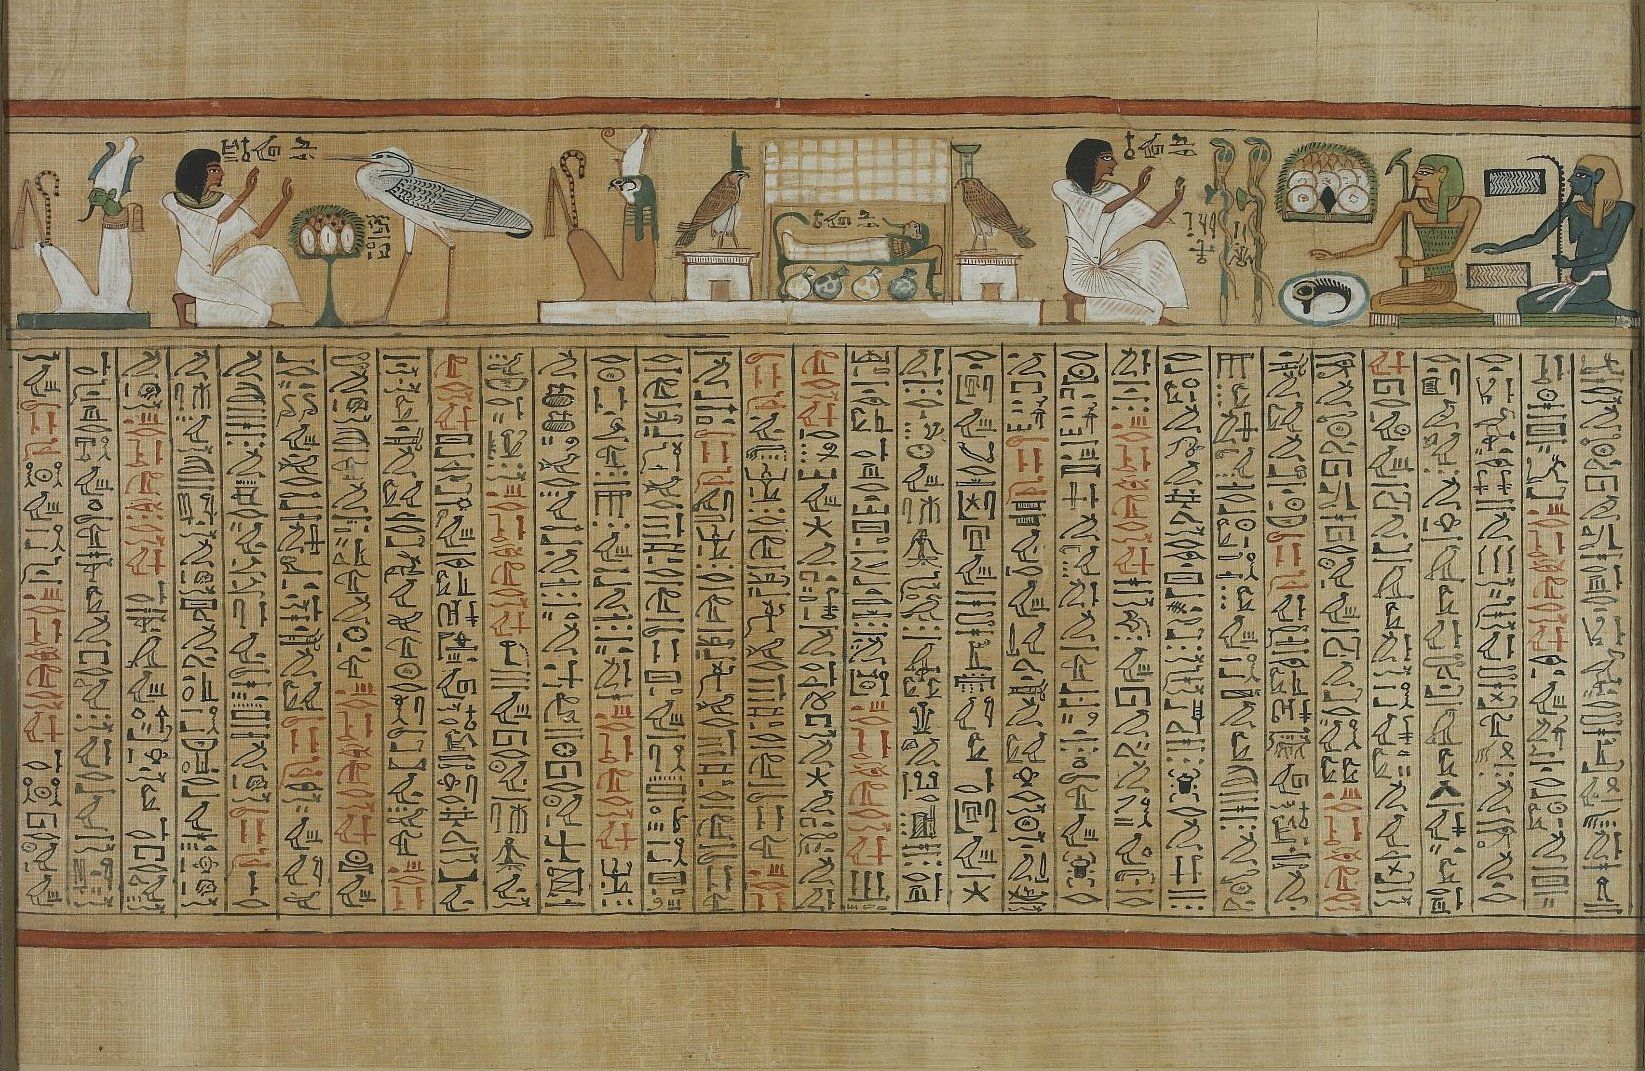 Egyptian Papyrus Computer Wallpaper